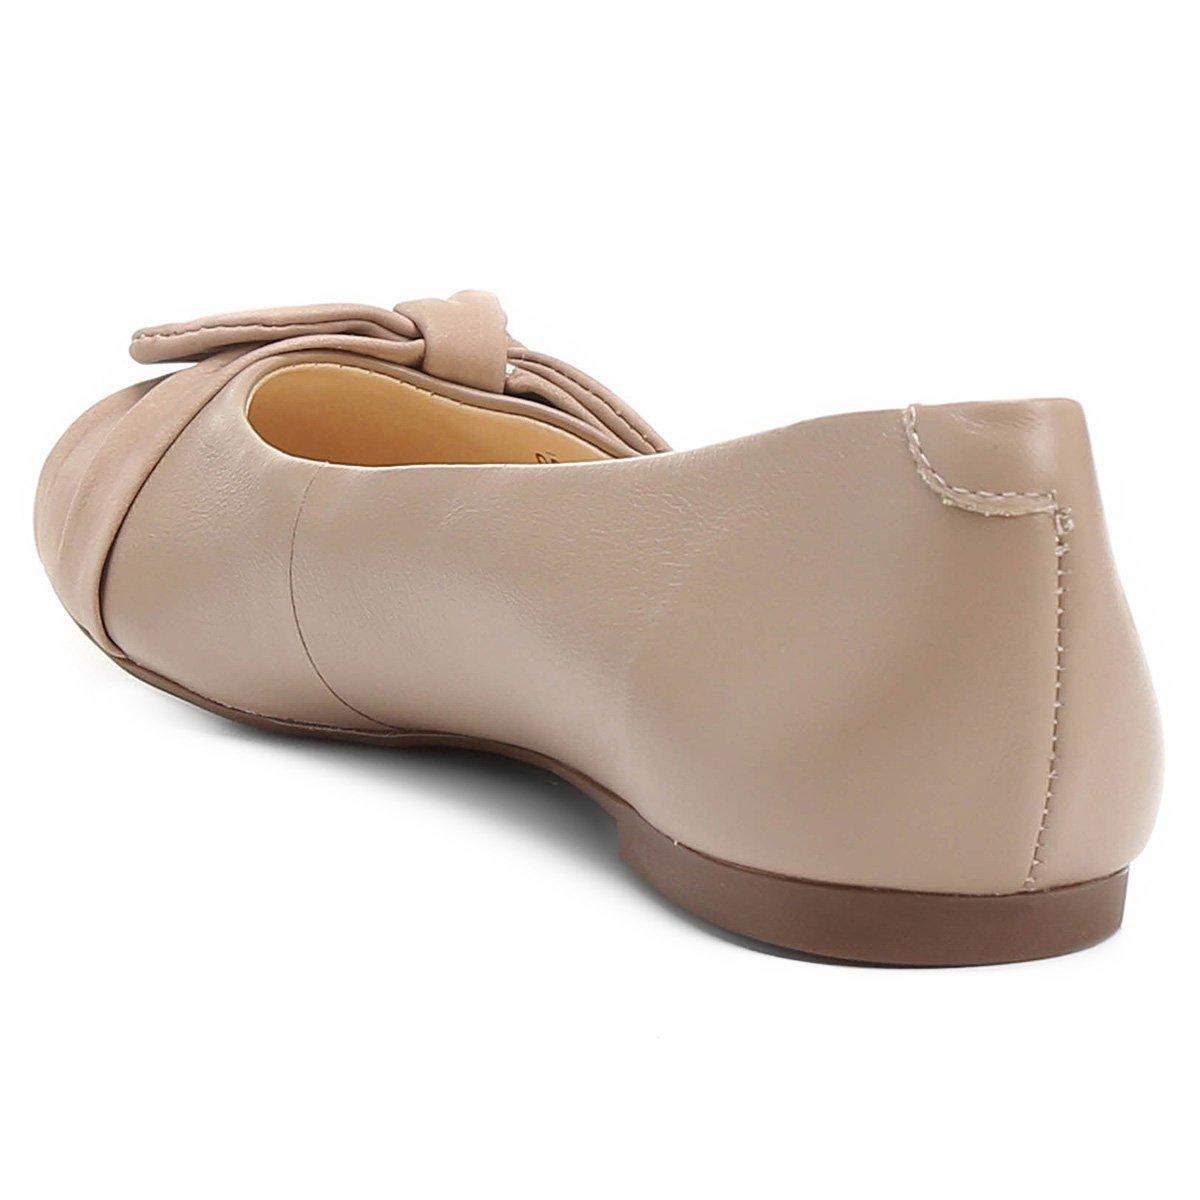 Laço Feminina Sapatilha Couro Nude Shoestock Shoestock Couro Laço Sapatilha nvAY11W